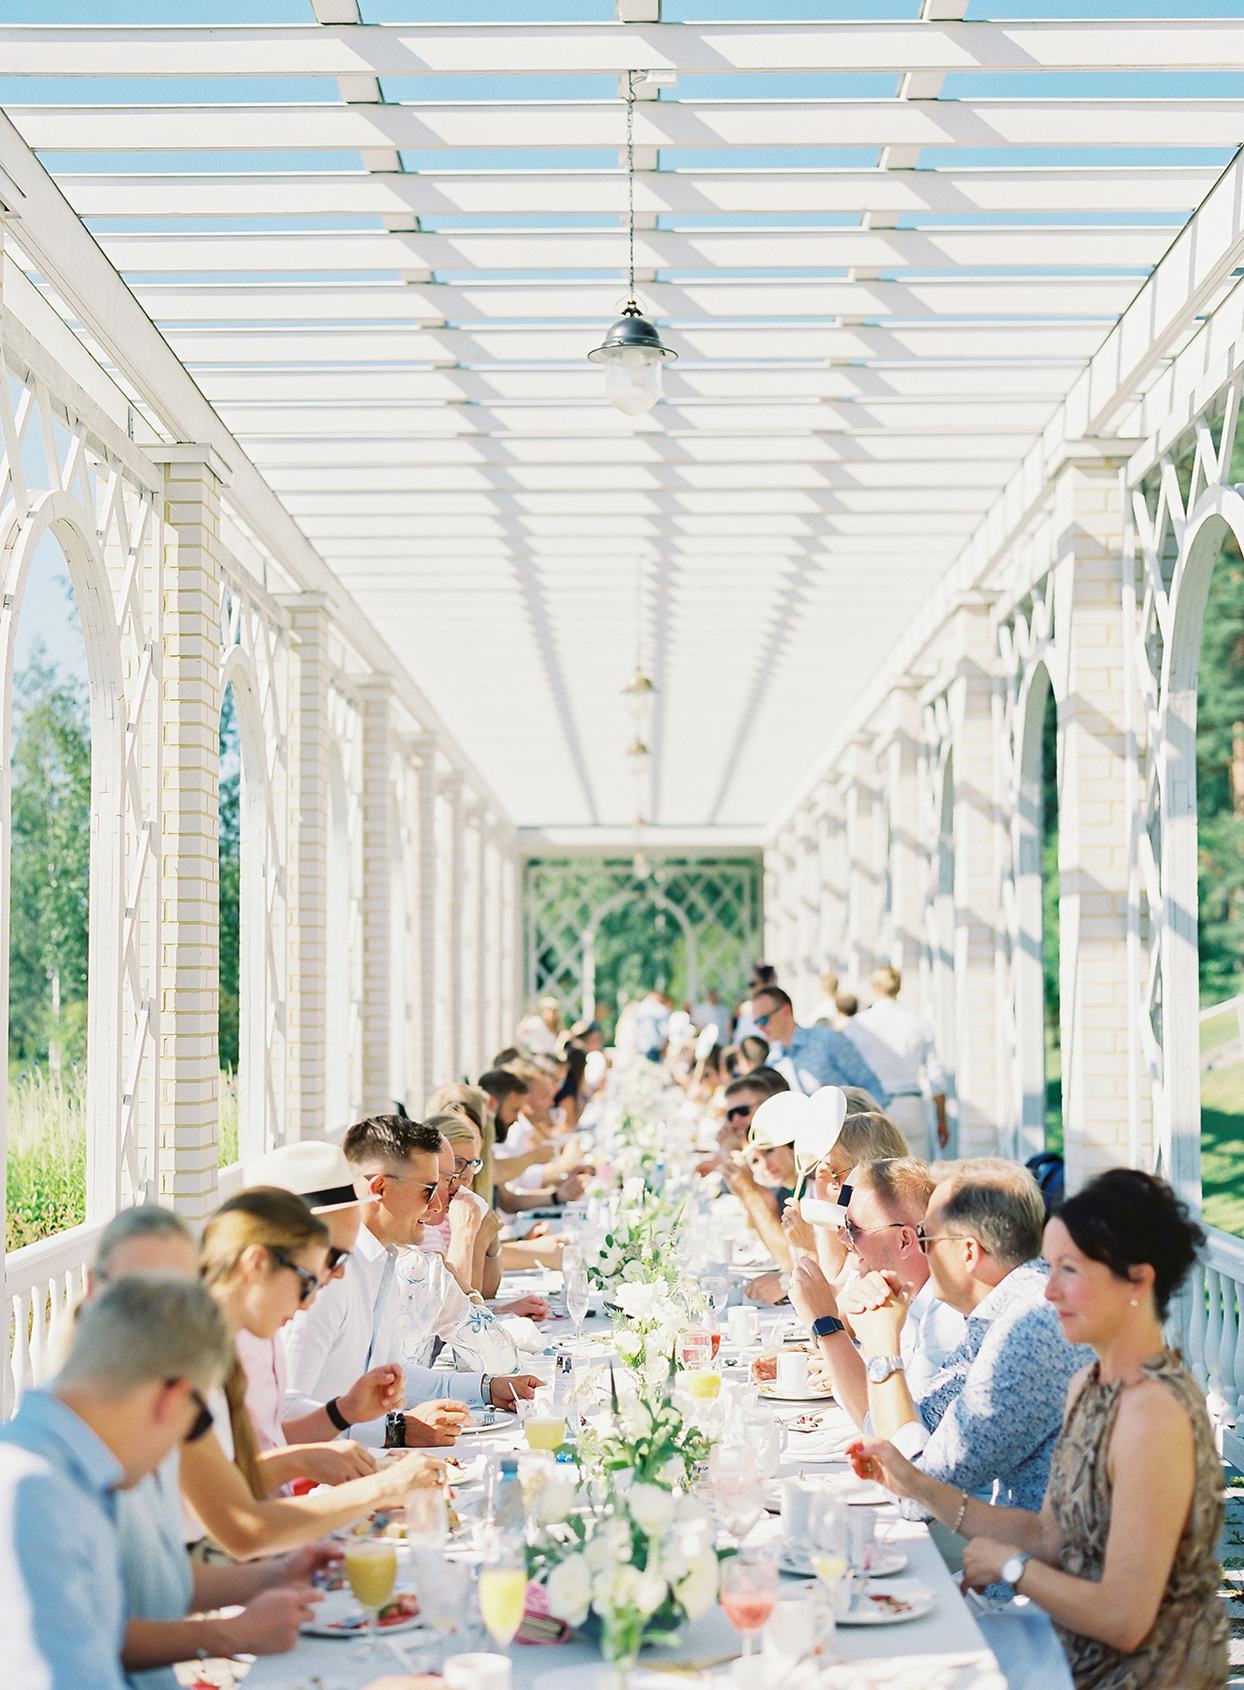 laura alexander wedding brunch guests at long outdoor table